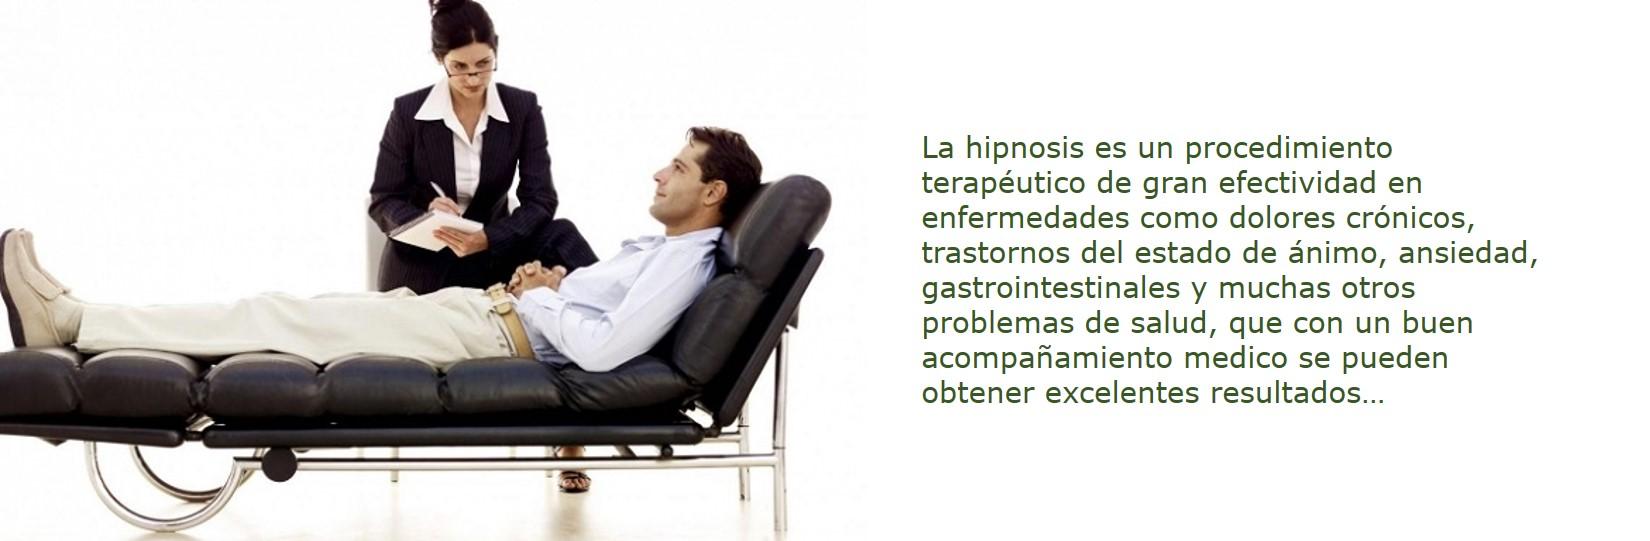 terapia con hipnosis